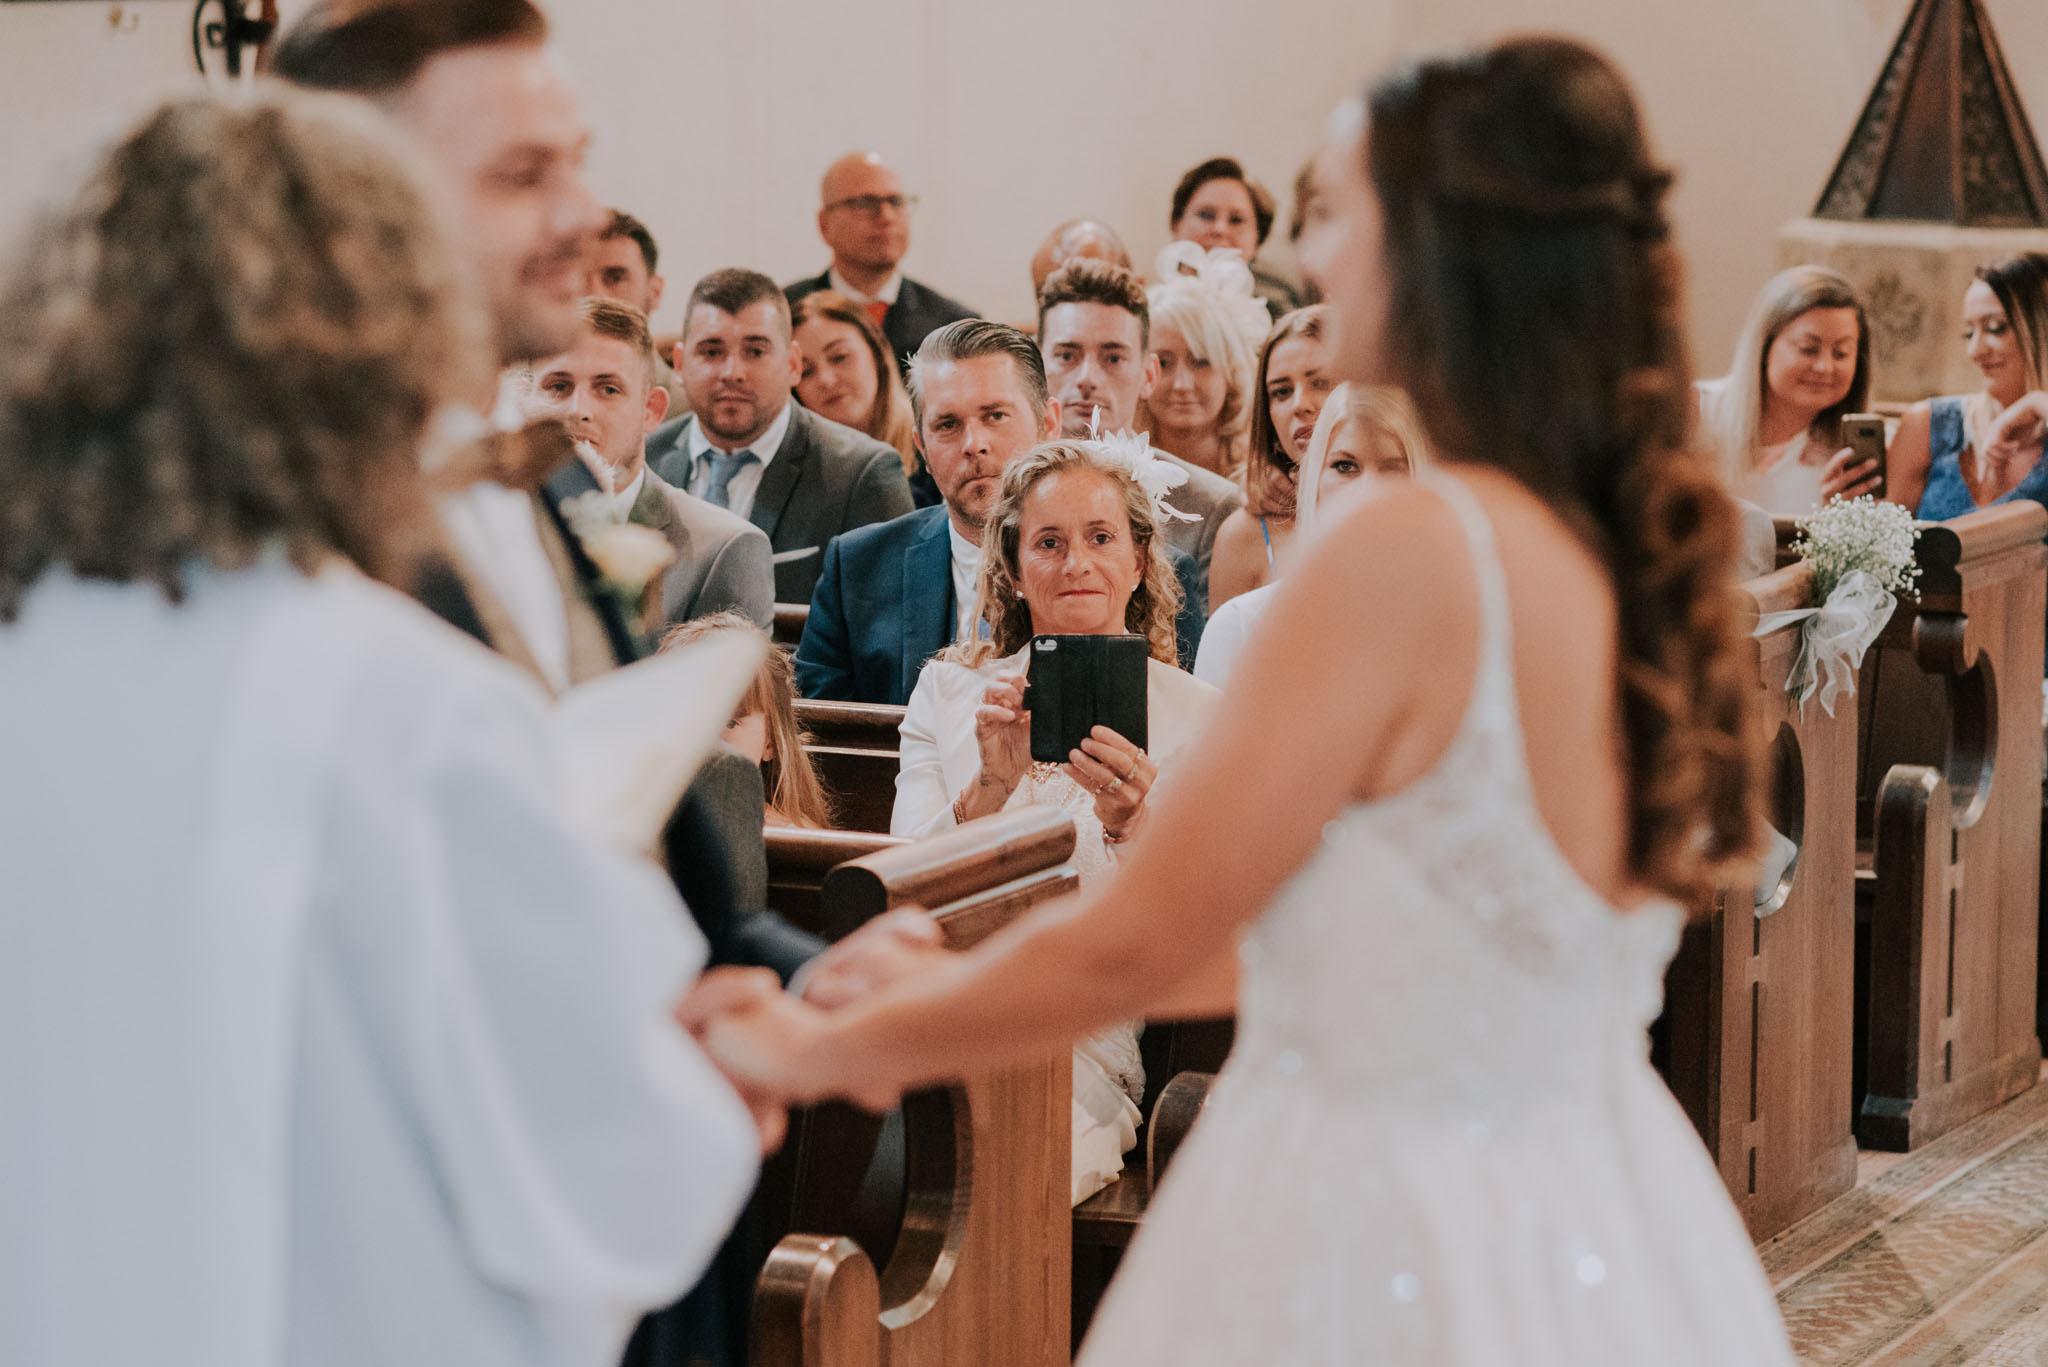 wedding-photographer-glewstone-court-hereford-scott-stockwell-photography189.jpg